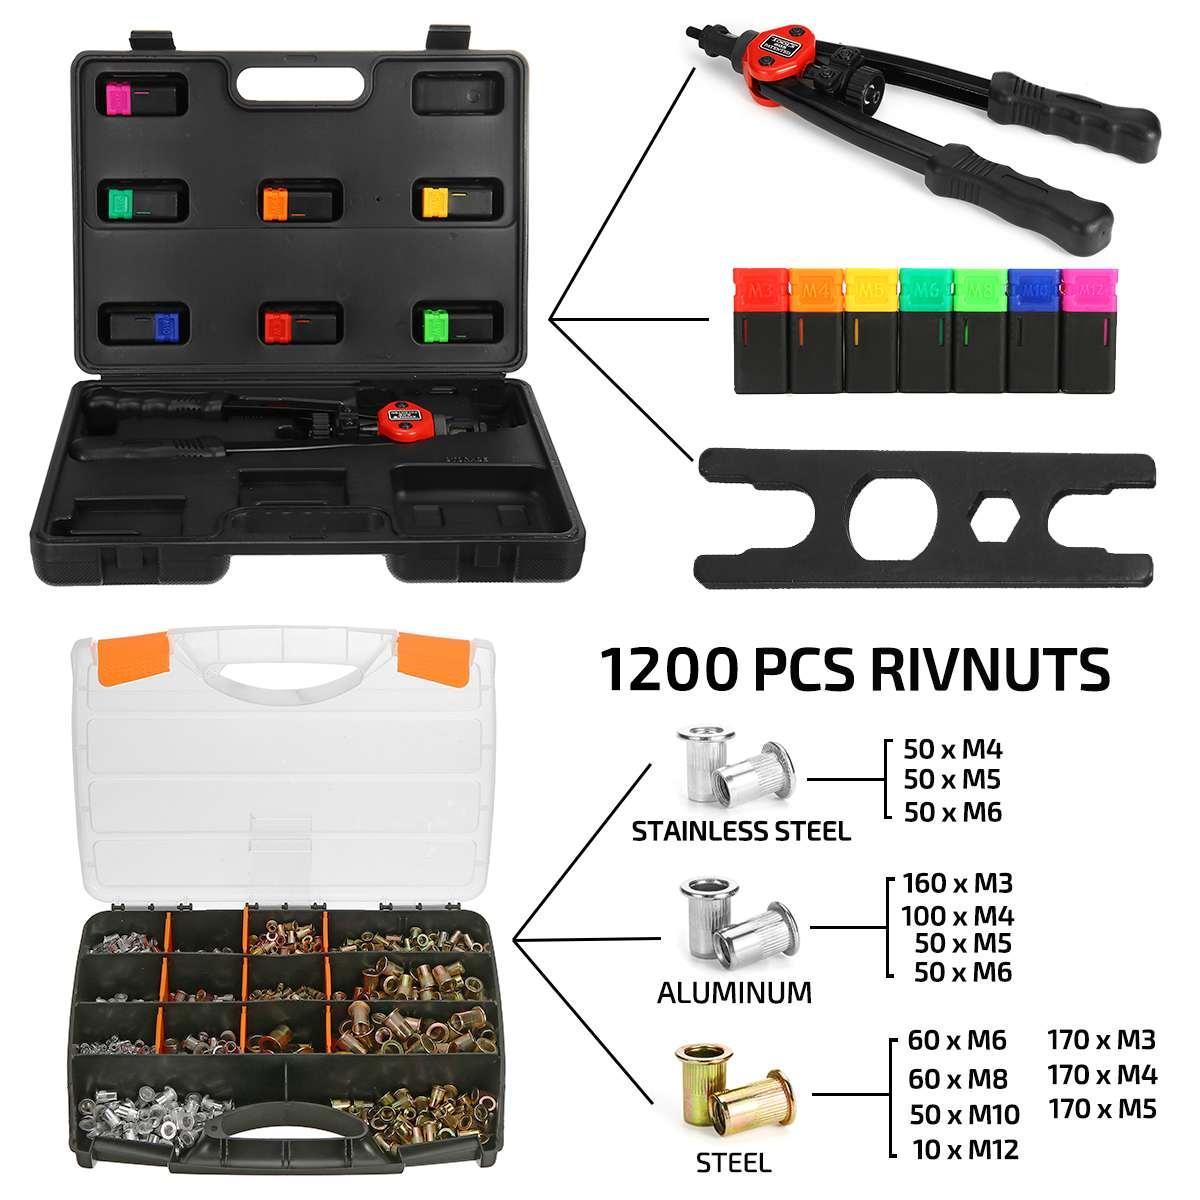 1200pcs Nutsert Tool Kit Rivnut Stainless Steel Rivet Nut Mandrels M3-M12 Nutsert Riveting Kit Household Repair Tools